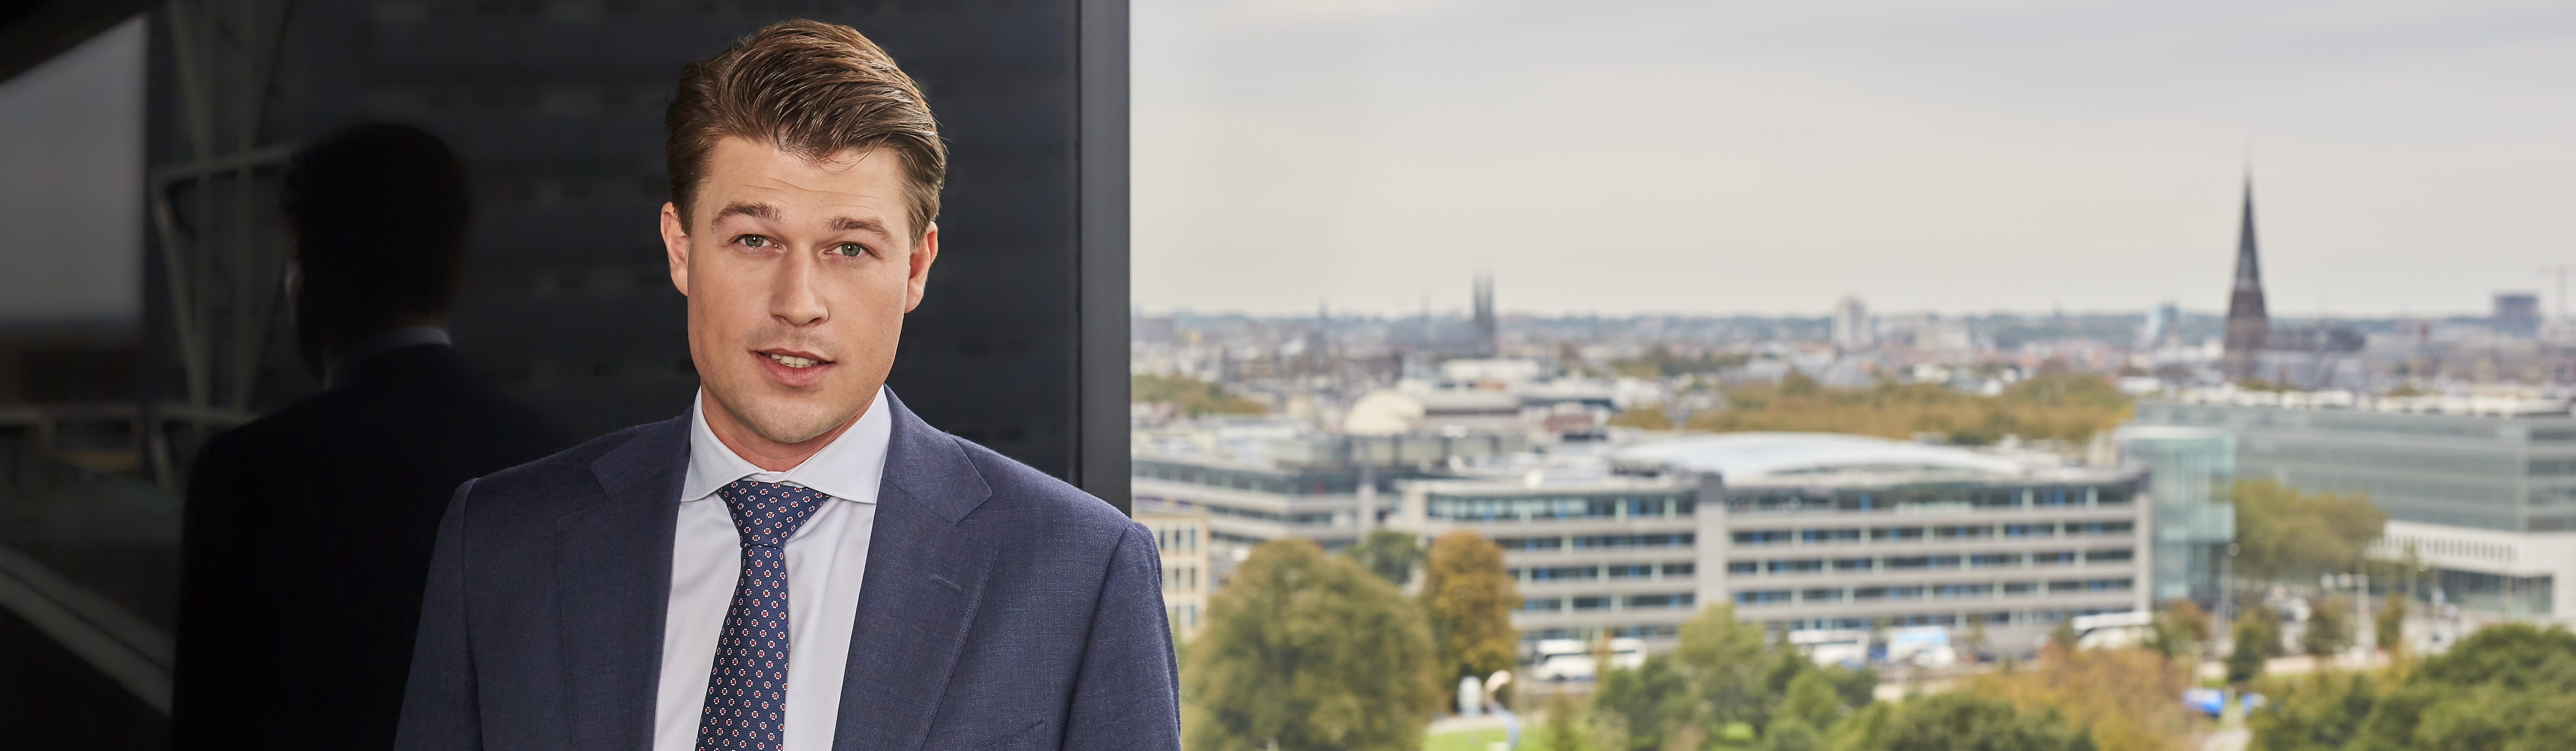 Jos Verburg, kandidaat-notaris Pels Rijcken